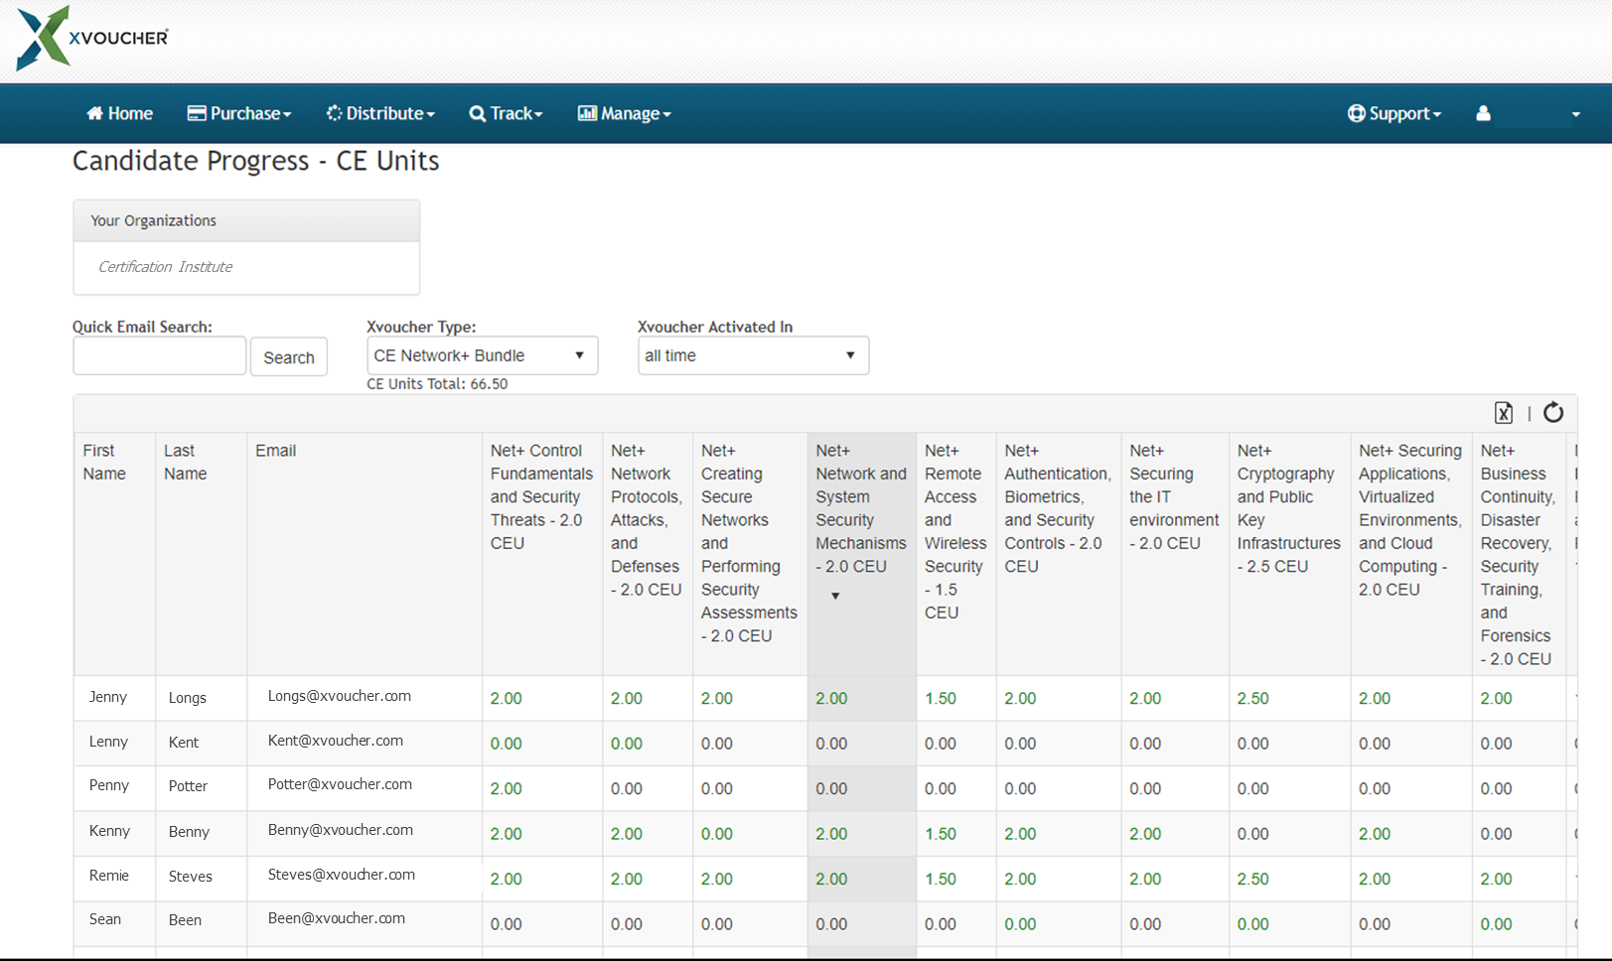 Customer CE Tracking